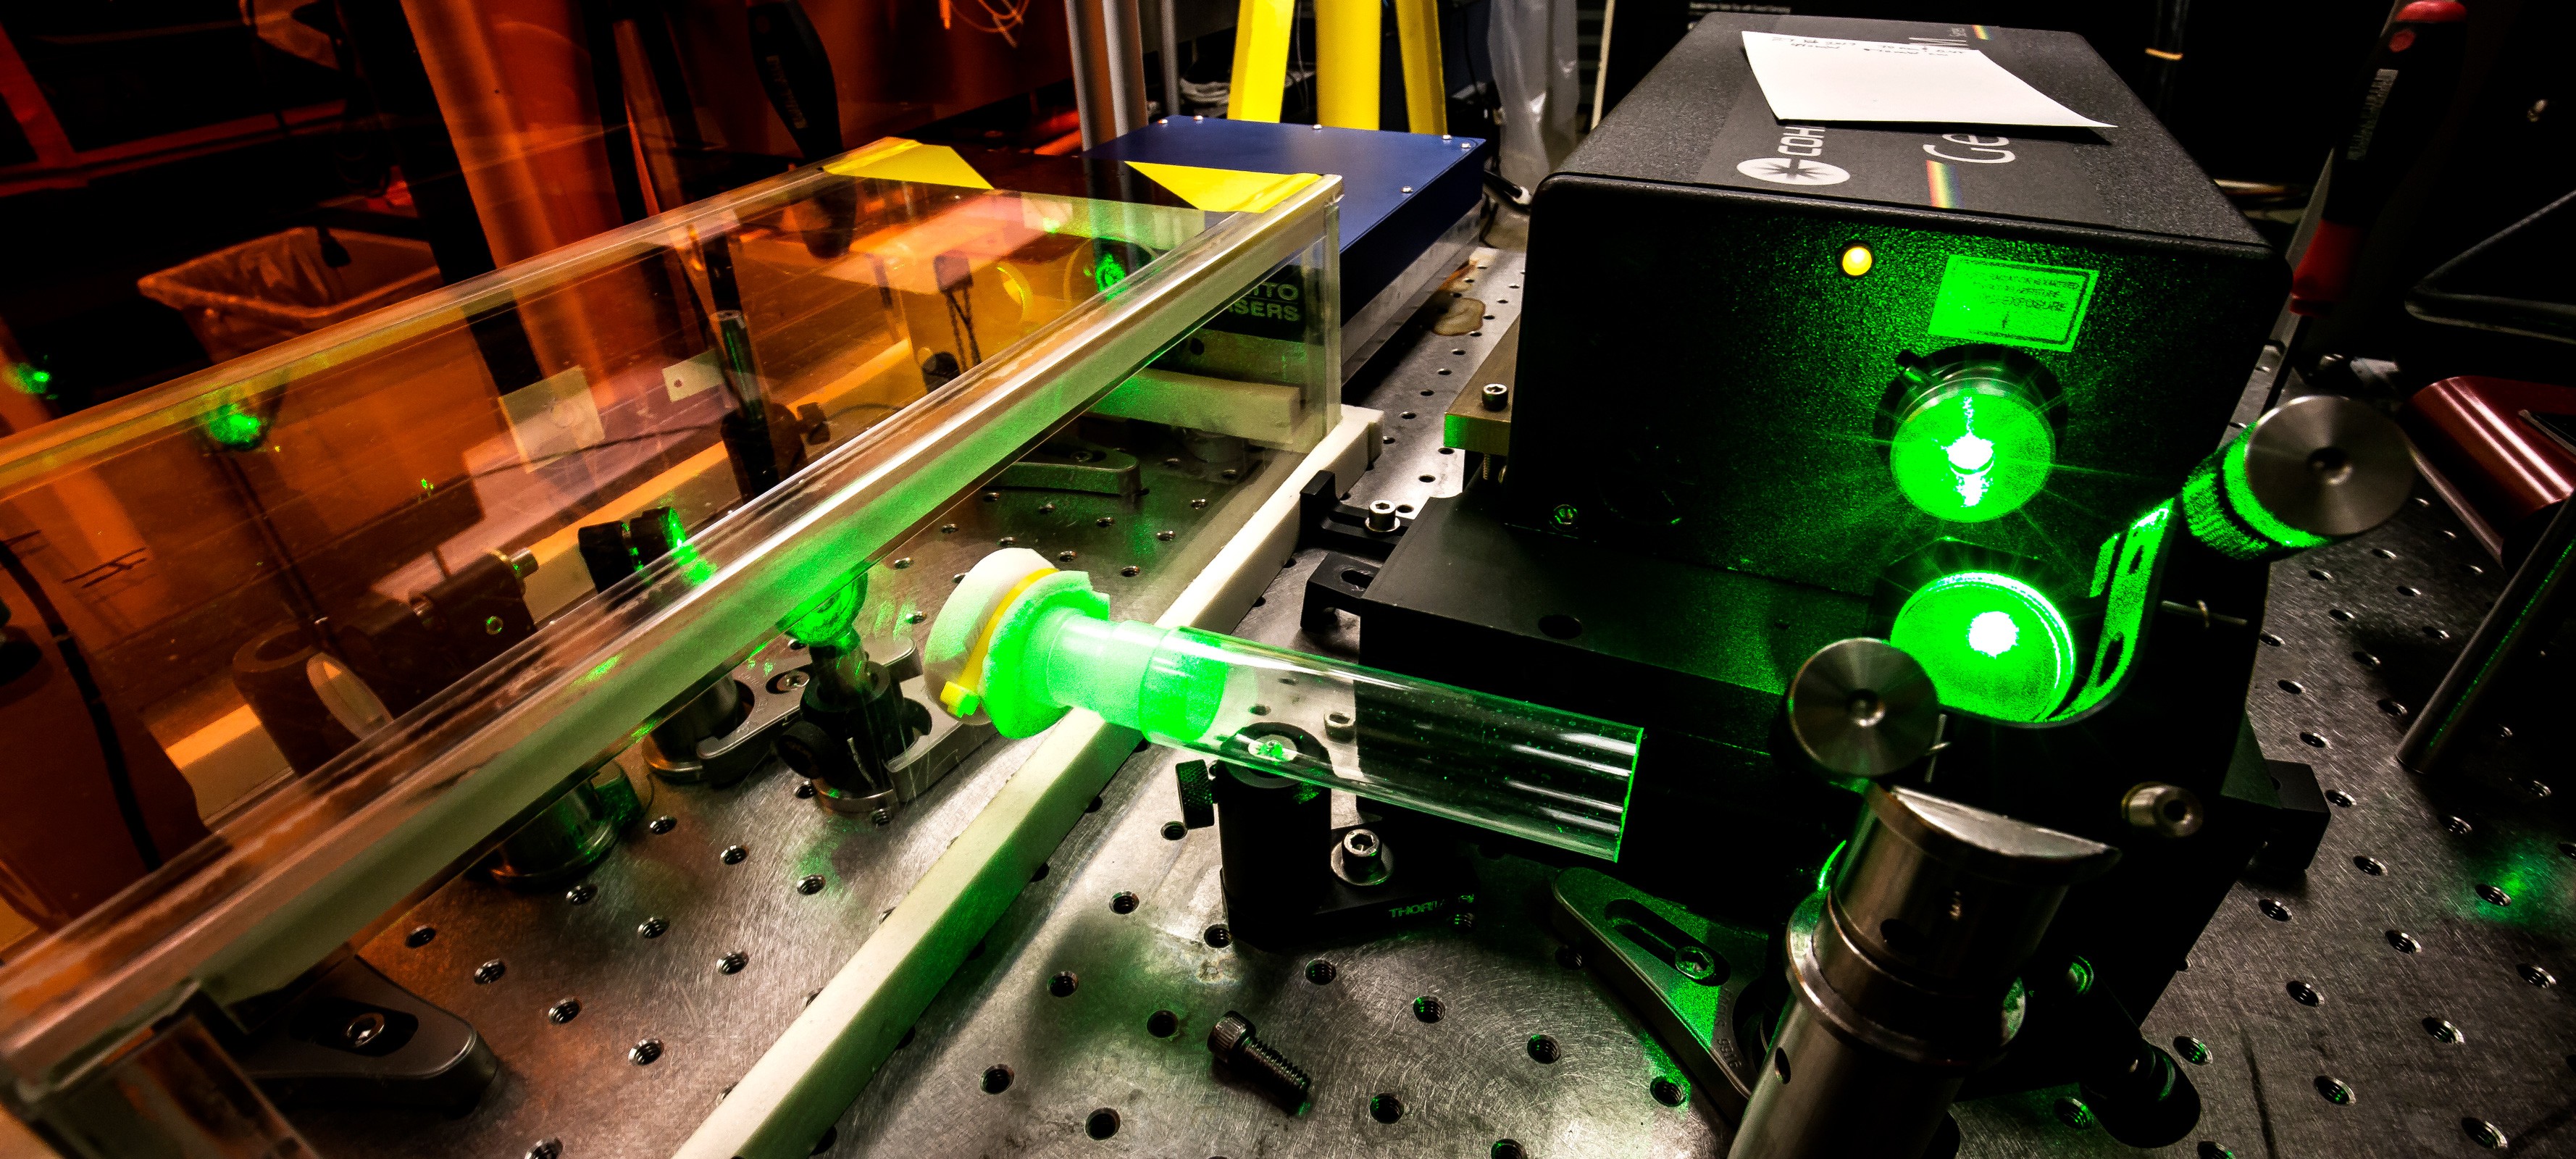 The HERCULES laser